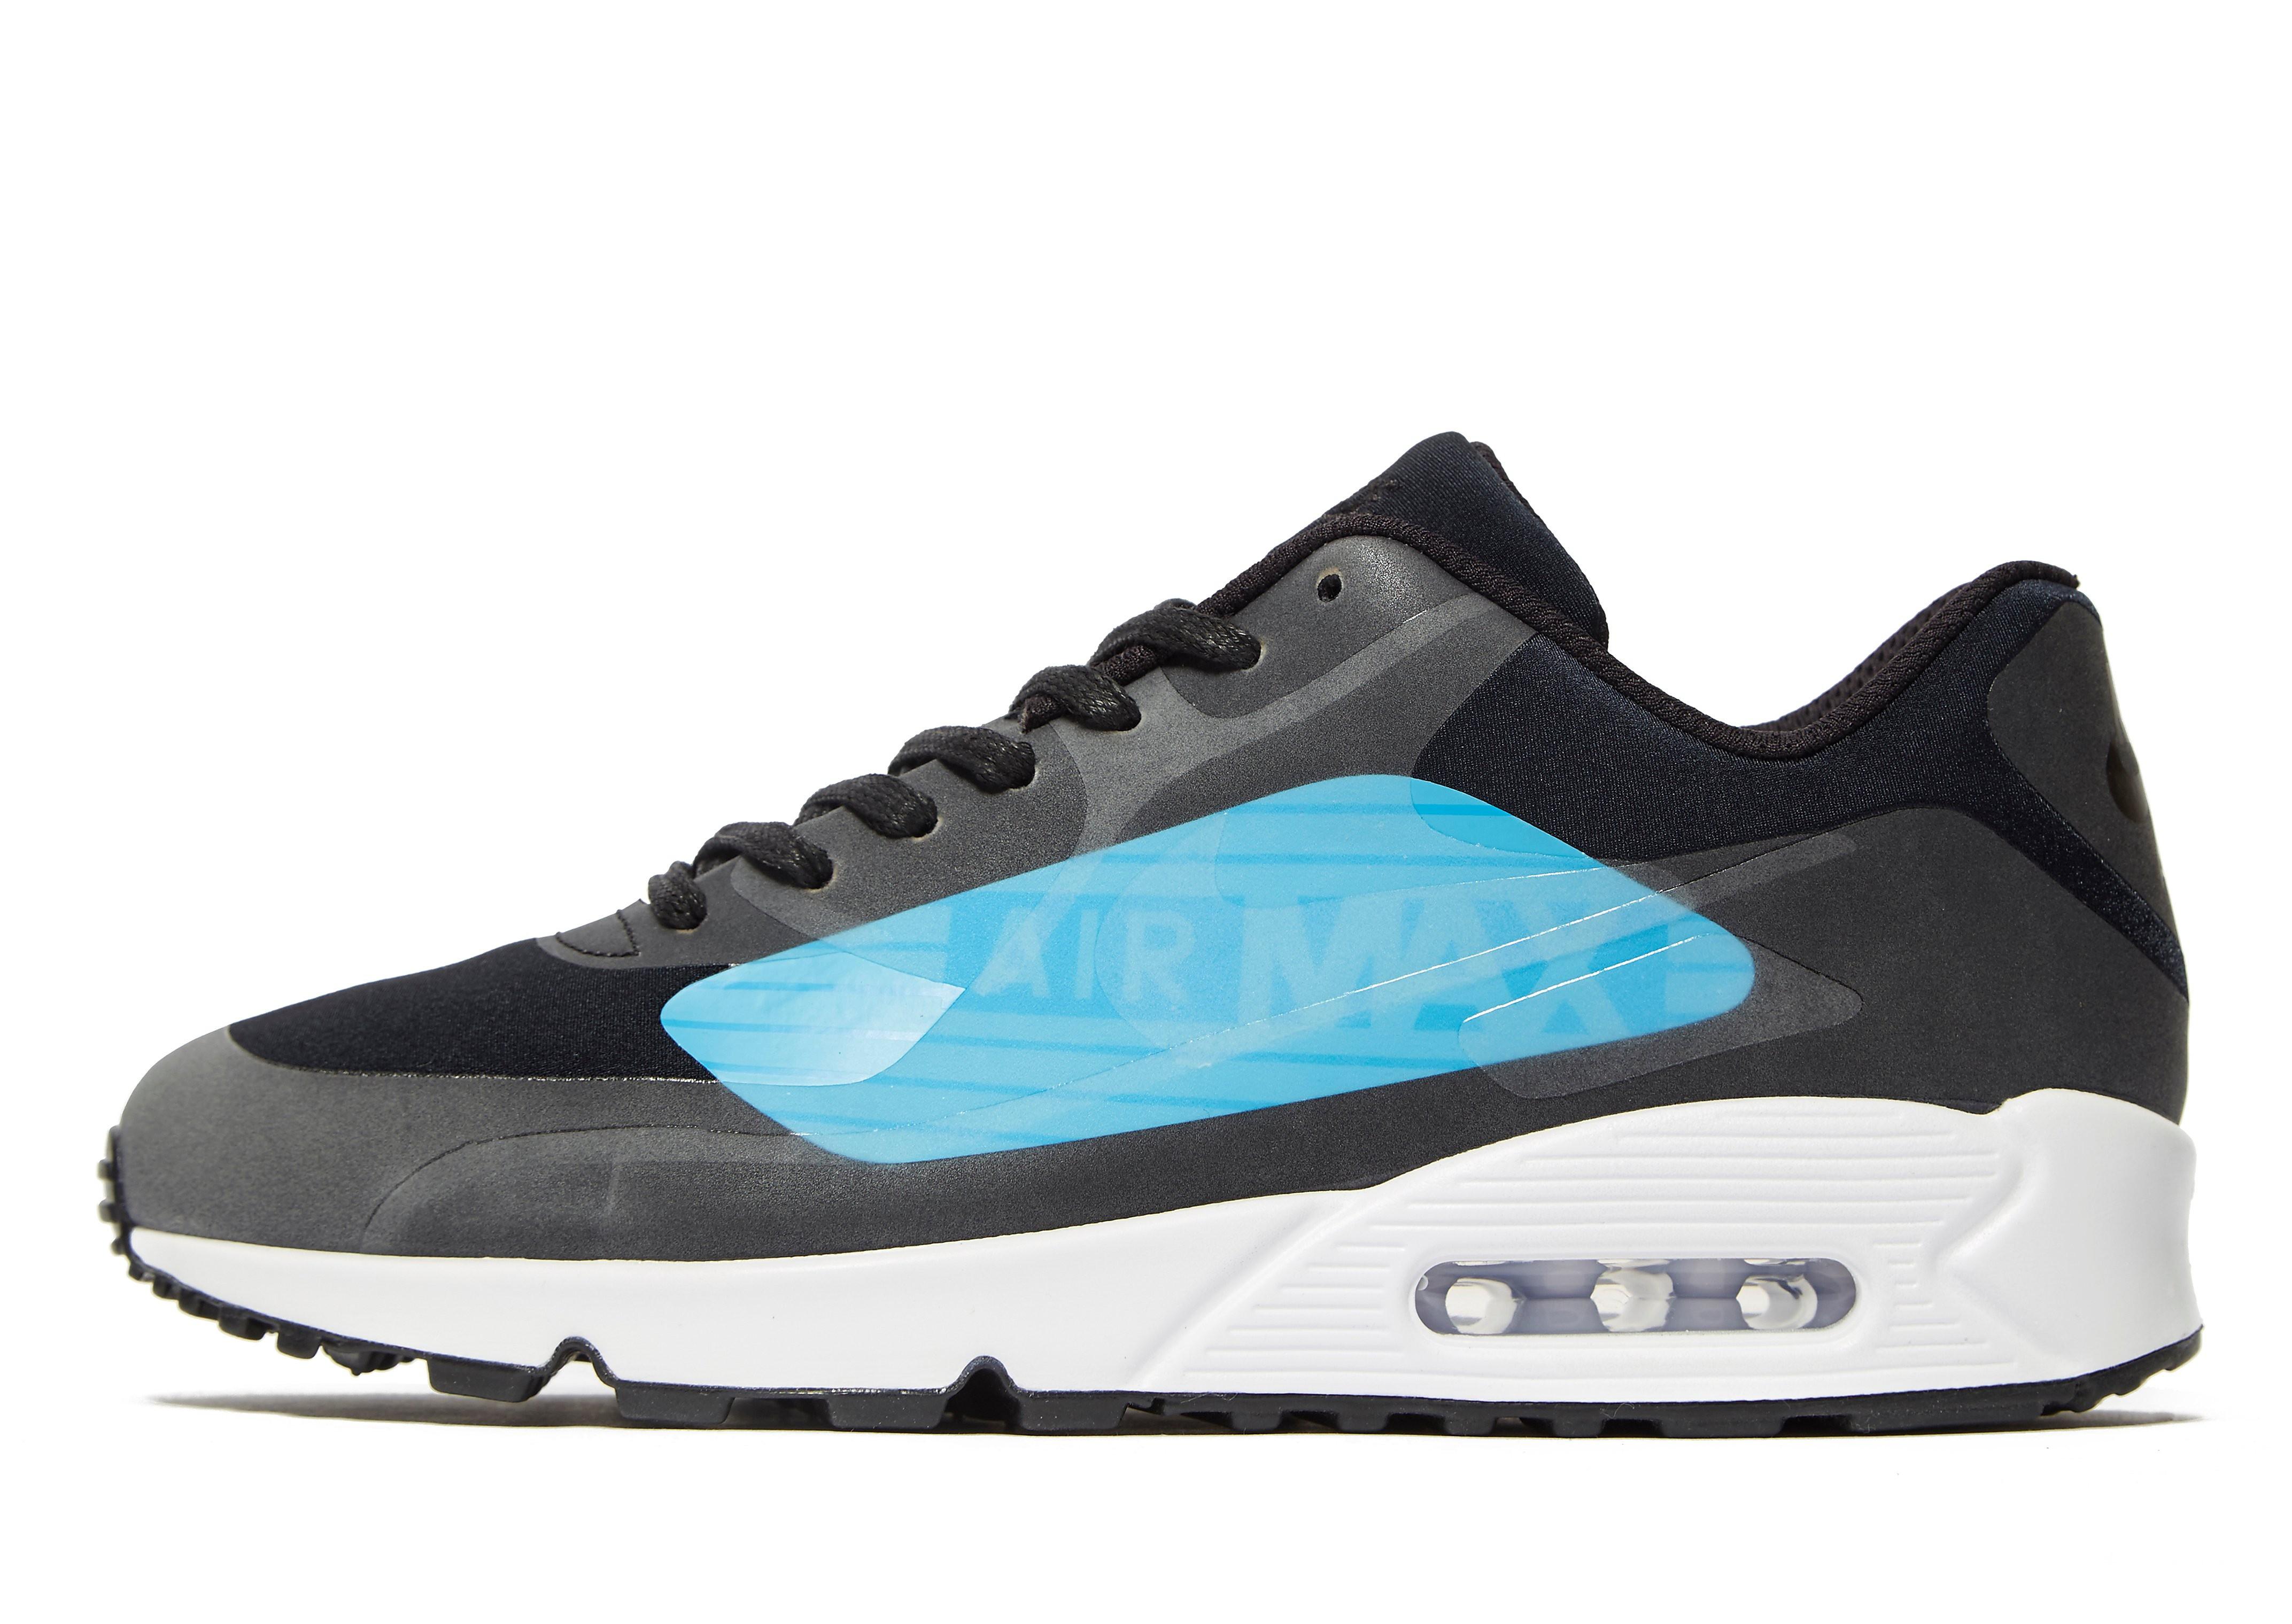 Nike - Air Max 90 Ultra Mid Winter - 924458401 - Color: Gris-Azul-Negro - Size: 42.5 y9ZgA3